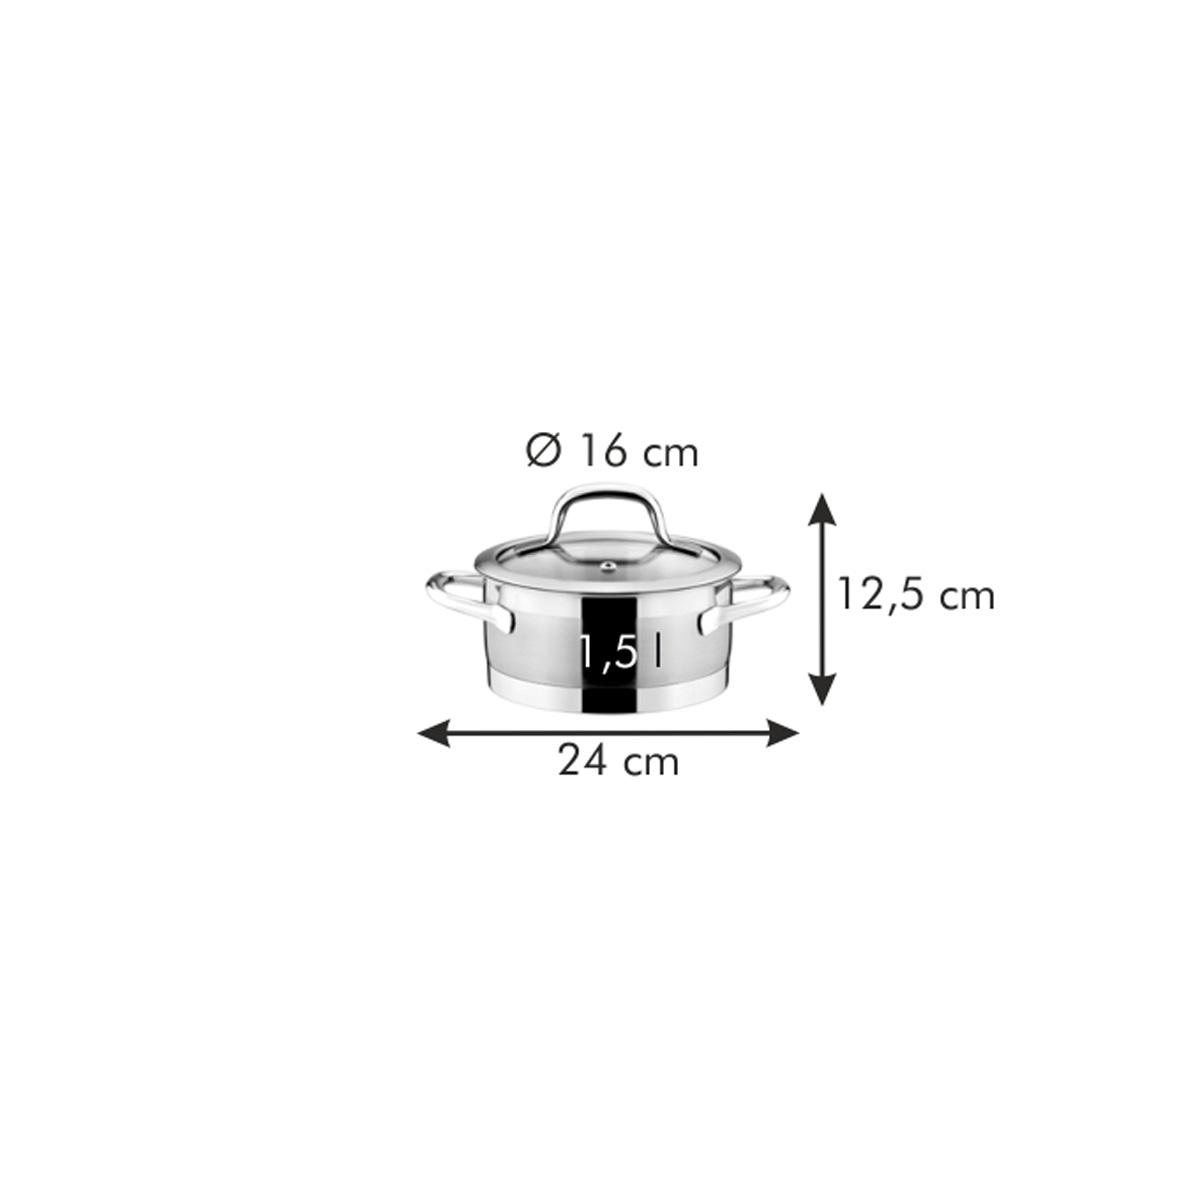 Kastrol PRESIDENT s poklicí ø 16 cm, 1.5 l